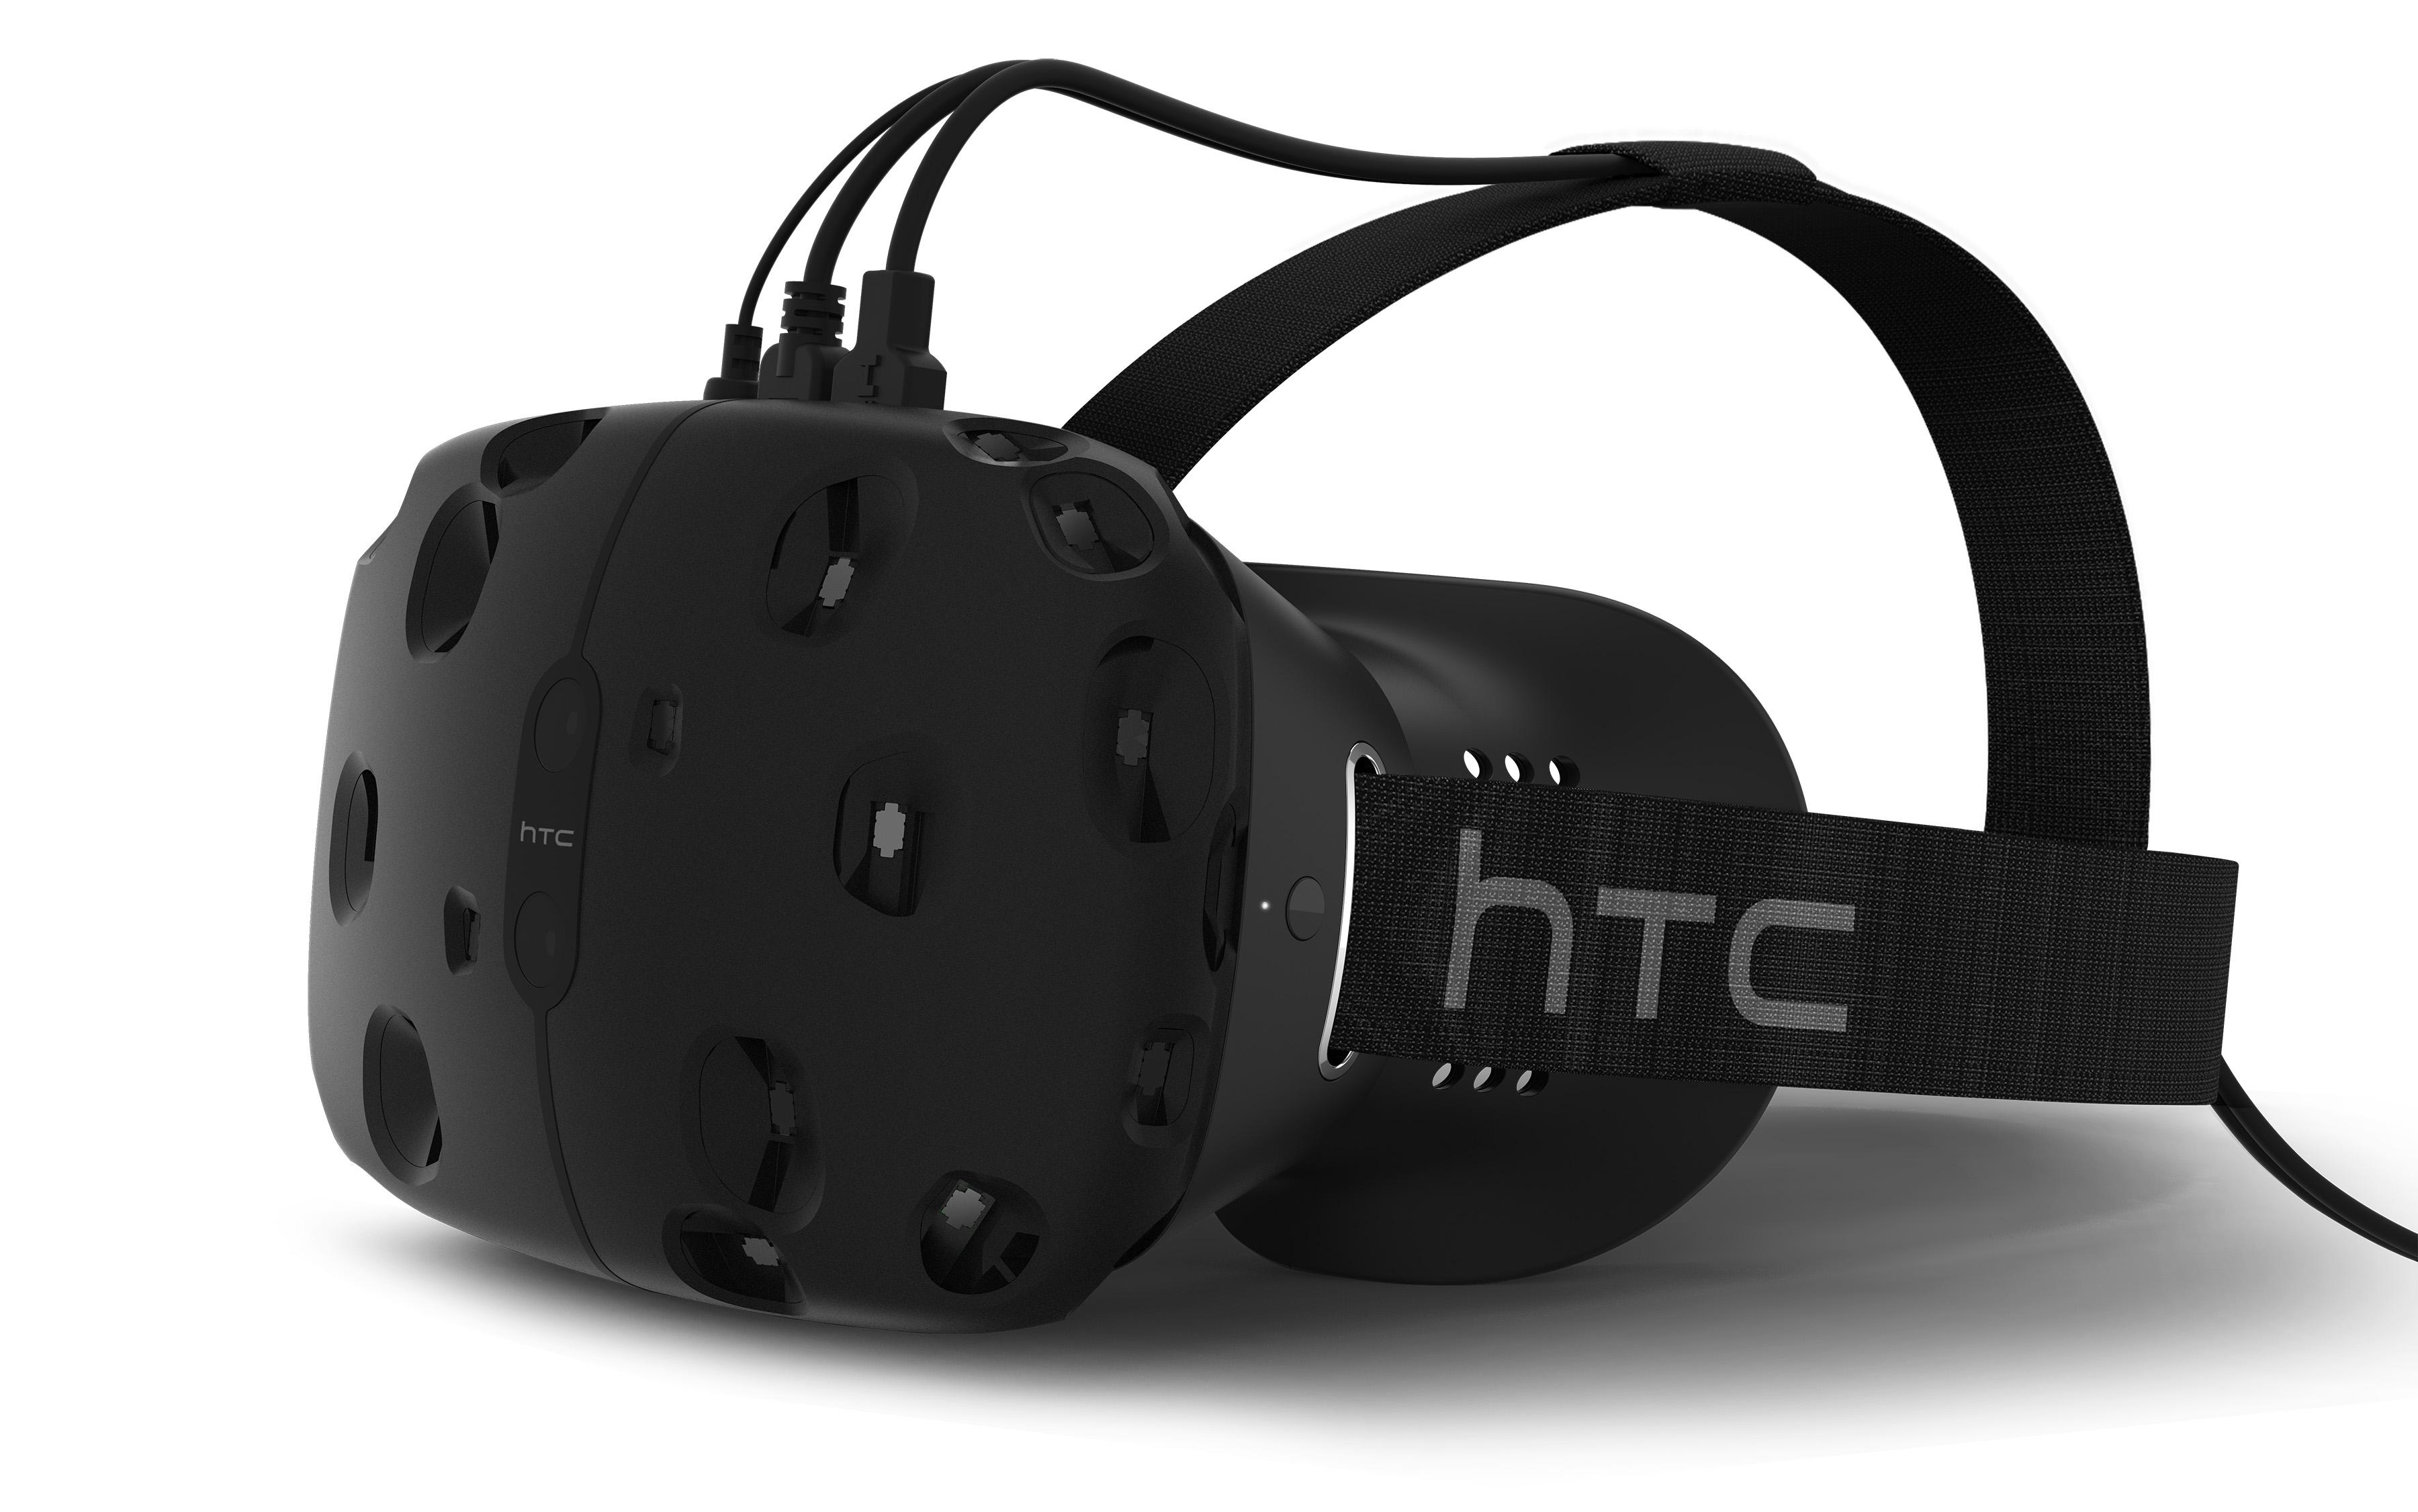 HTC nadal na minusie, nadzieja w VR